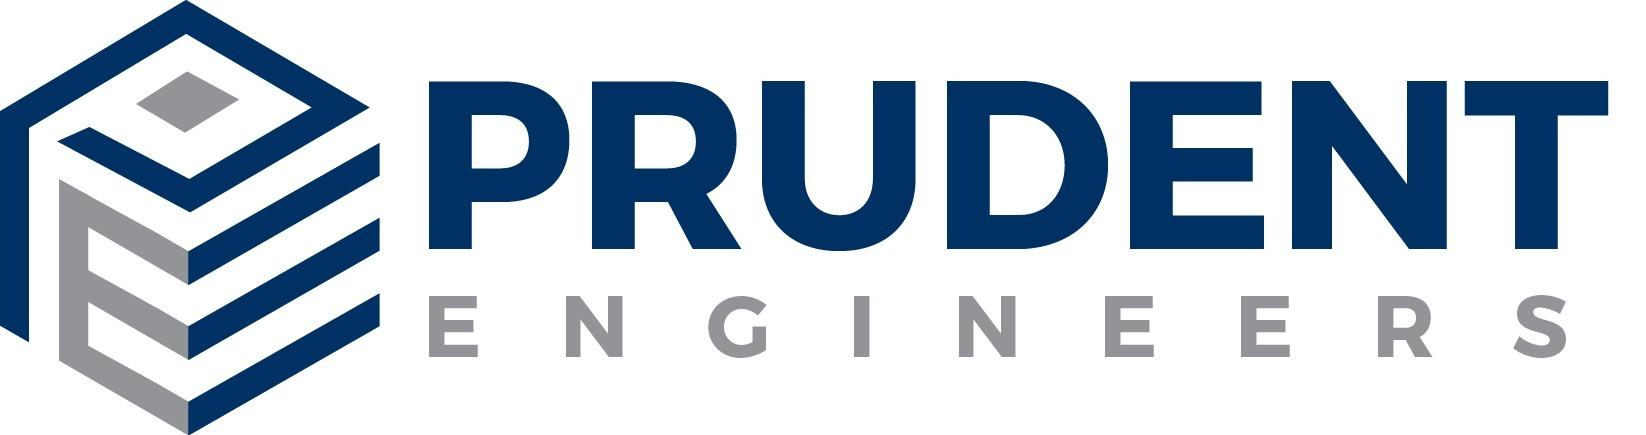 Prudent Engineers (@prudentengineers) Cover Image